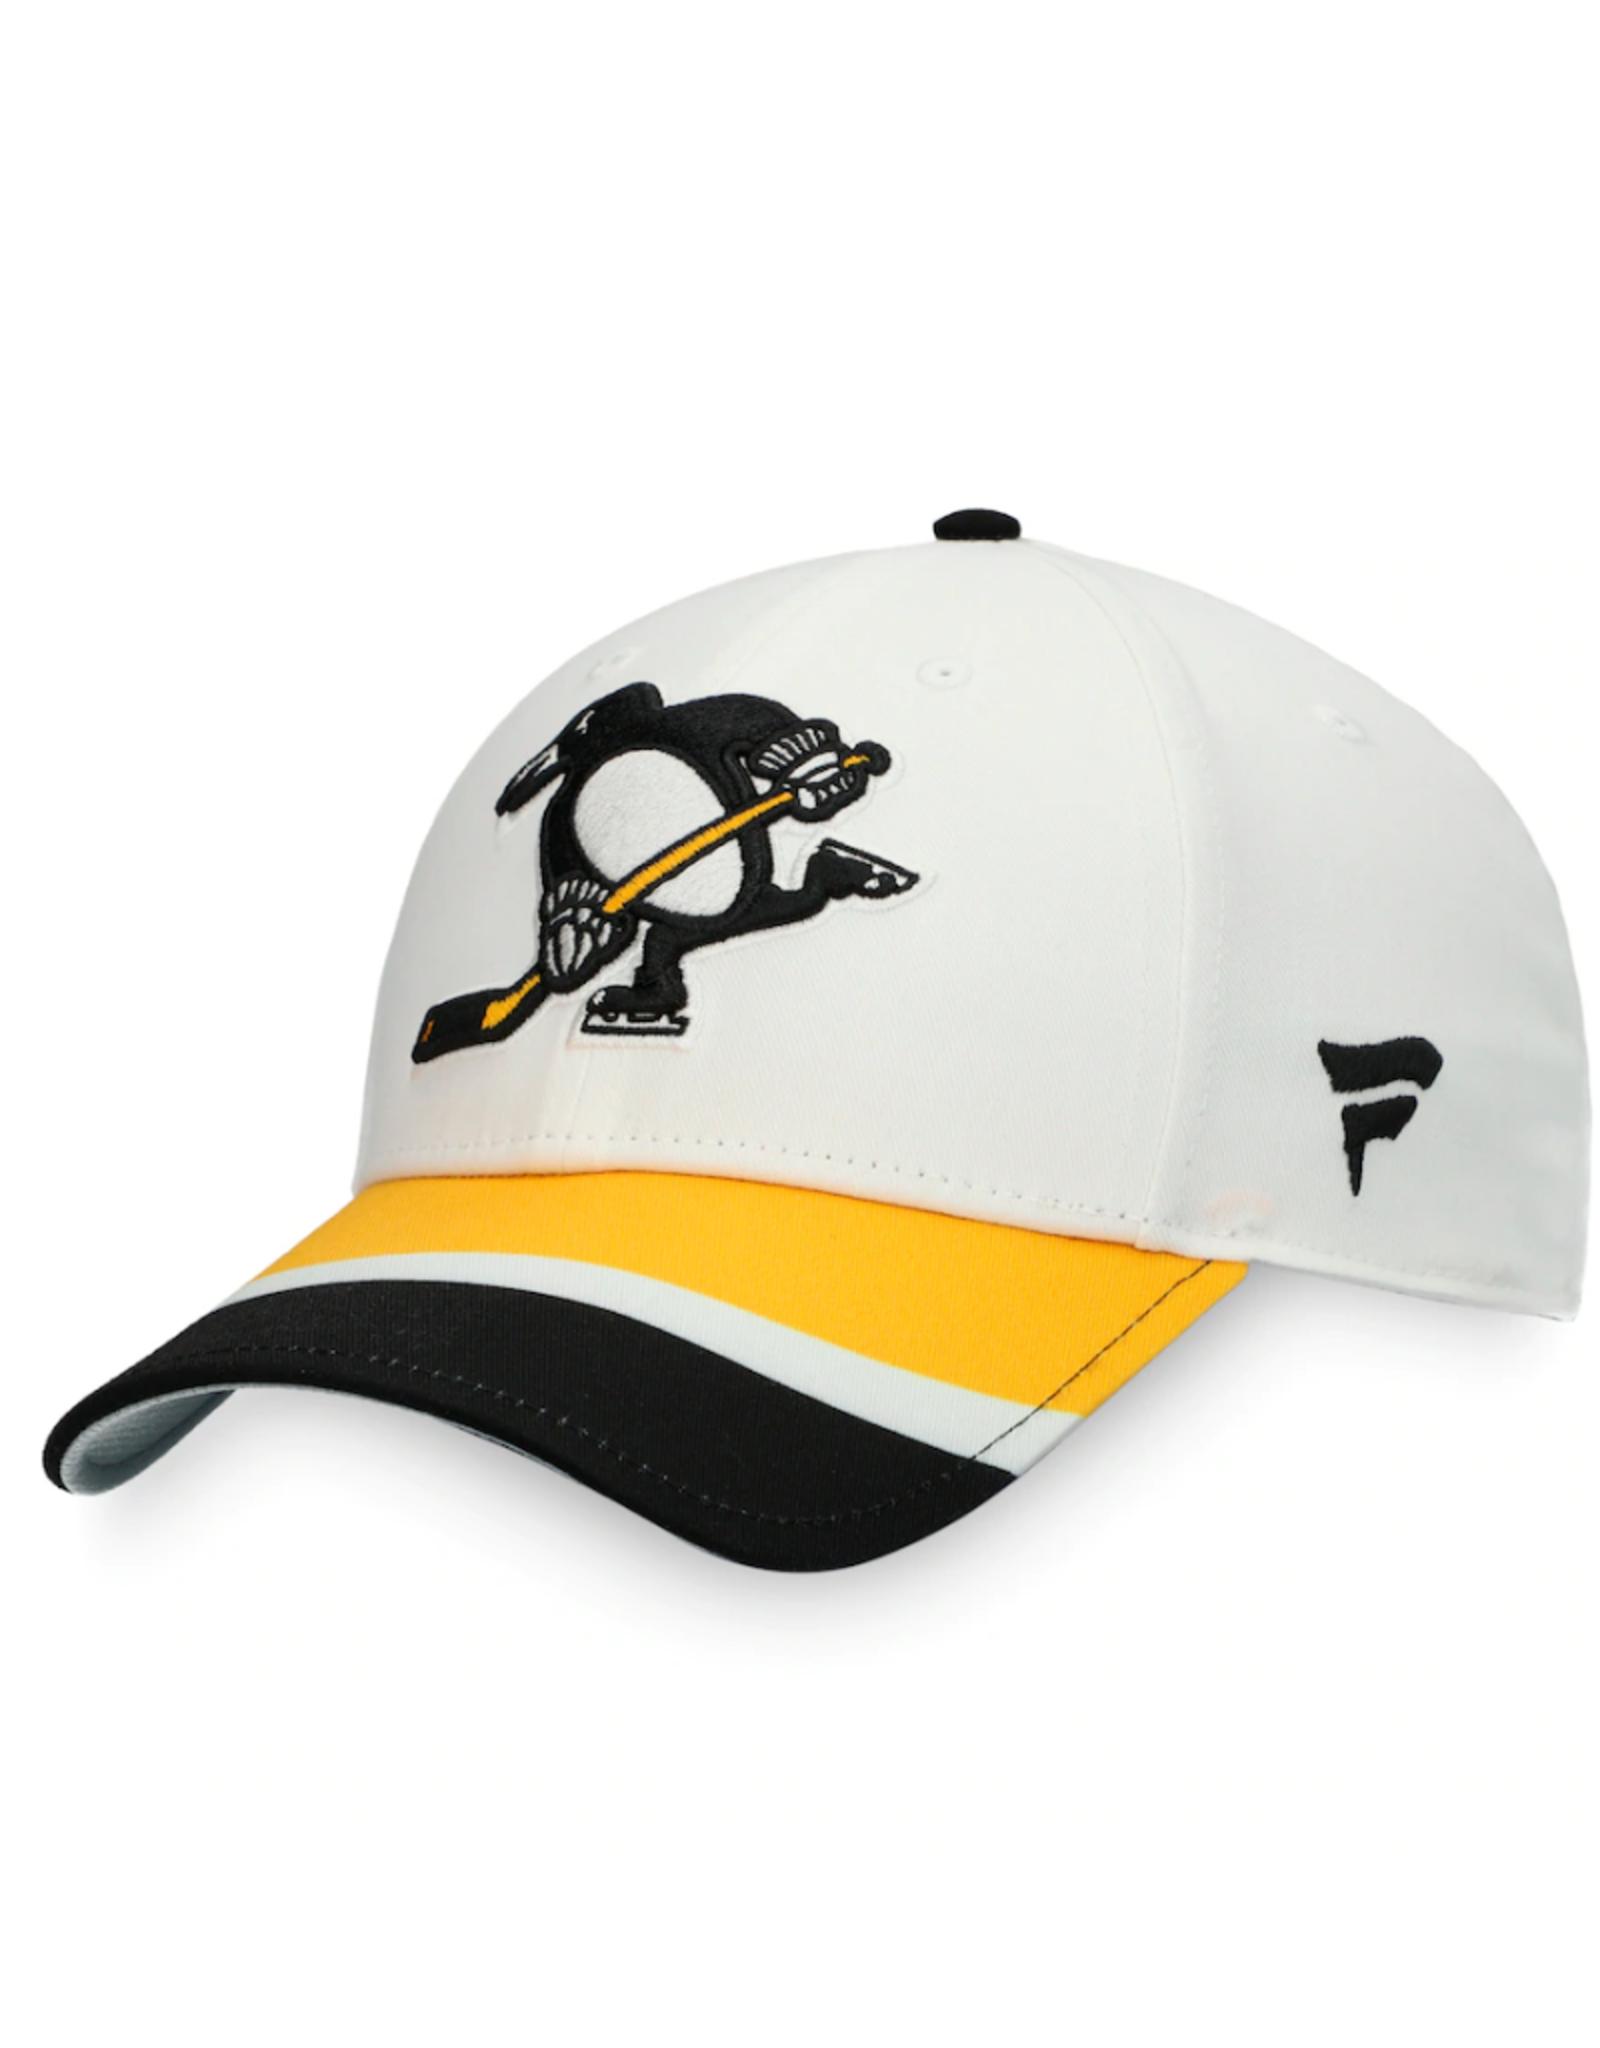 Fanatics Fanatics Men's Retro Reverse Adjustable Hat Pittsburgh Penguins White